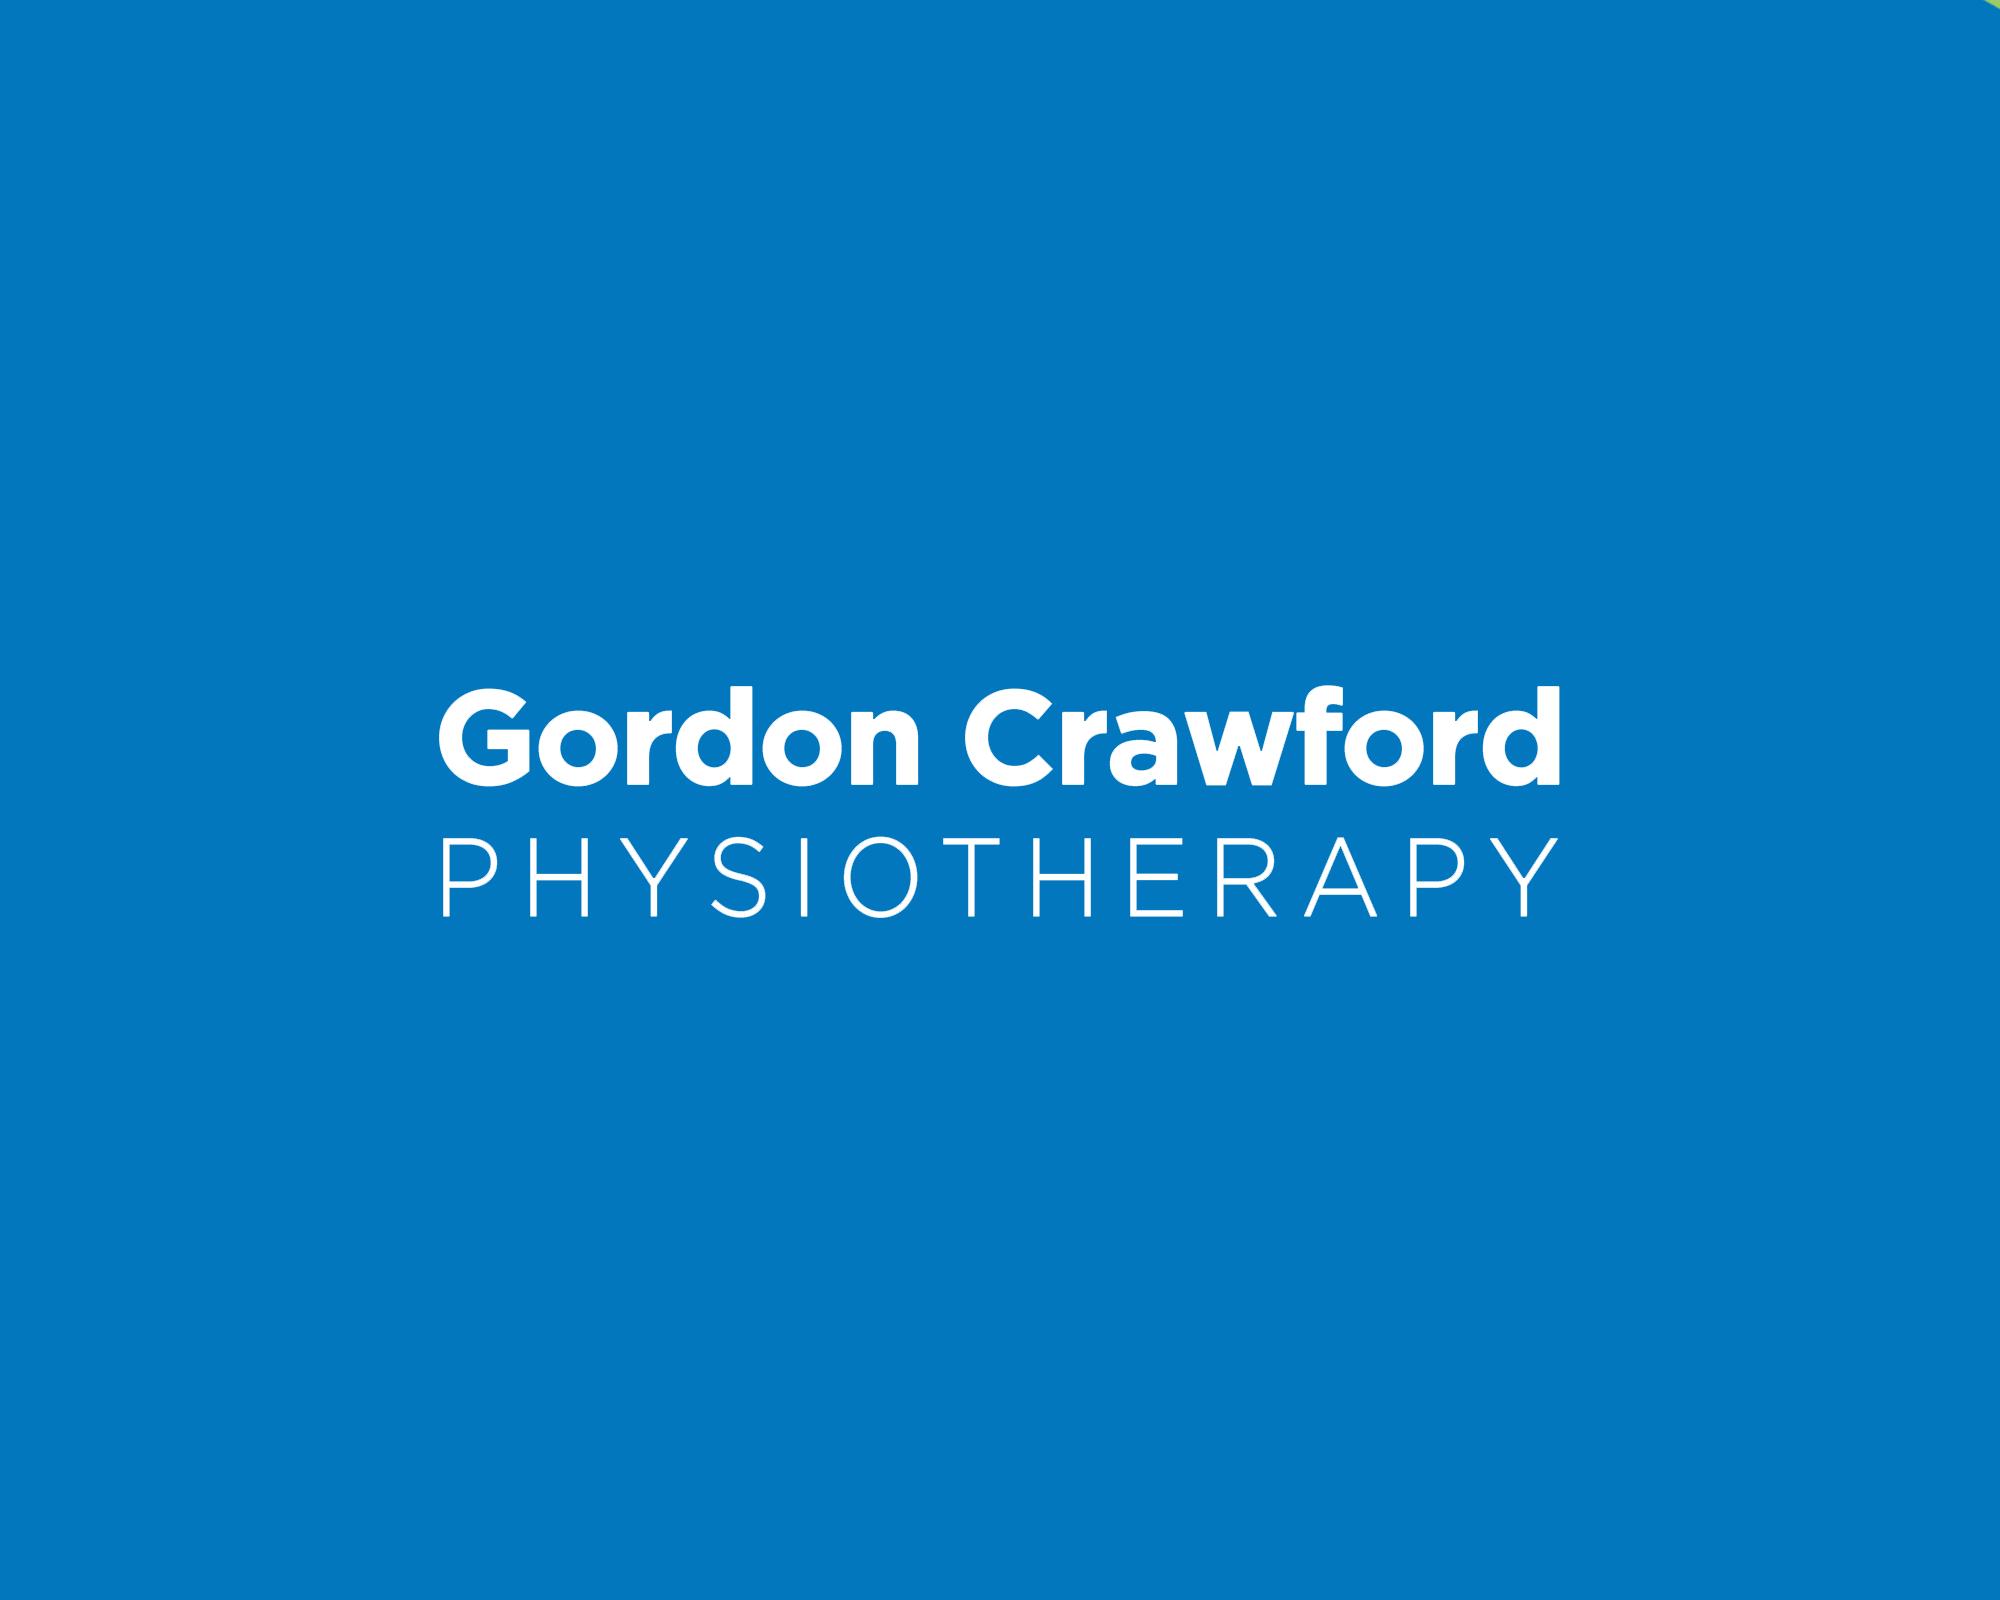 gordon crawford physiotherapy Logo